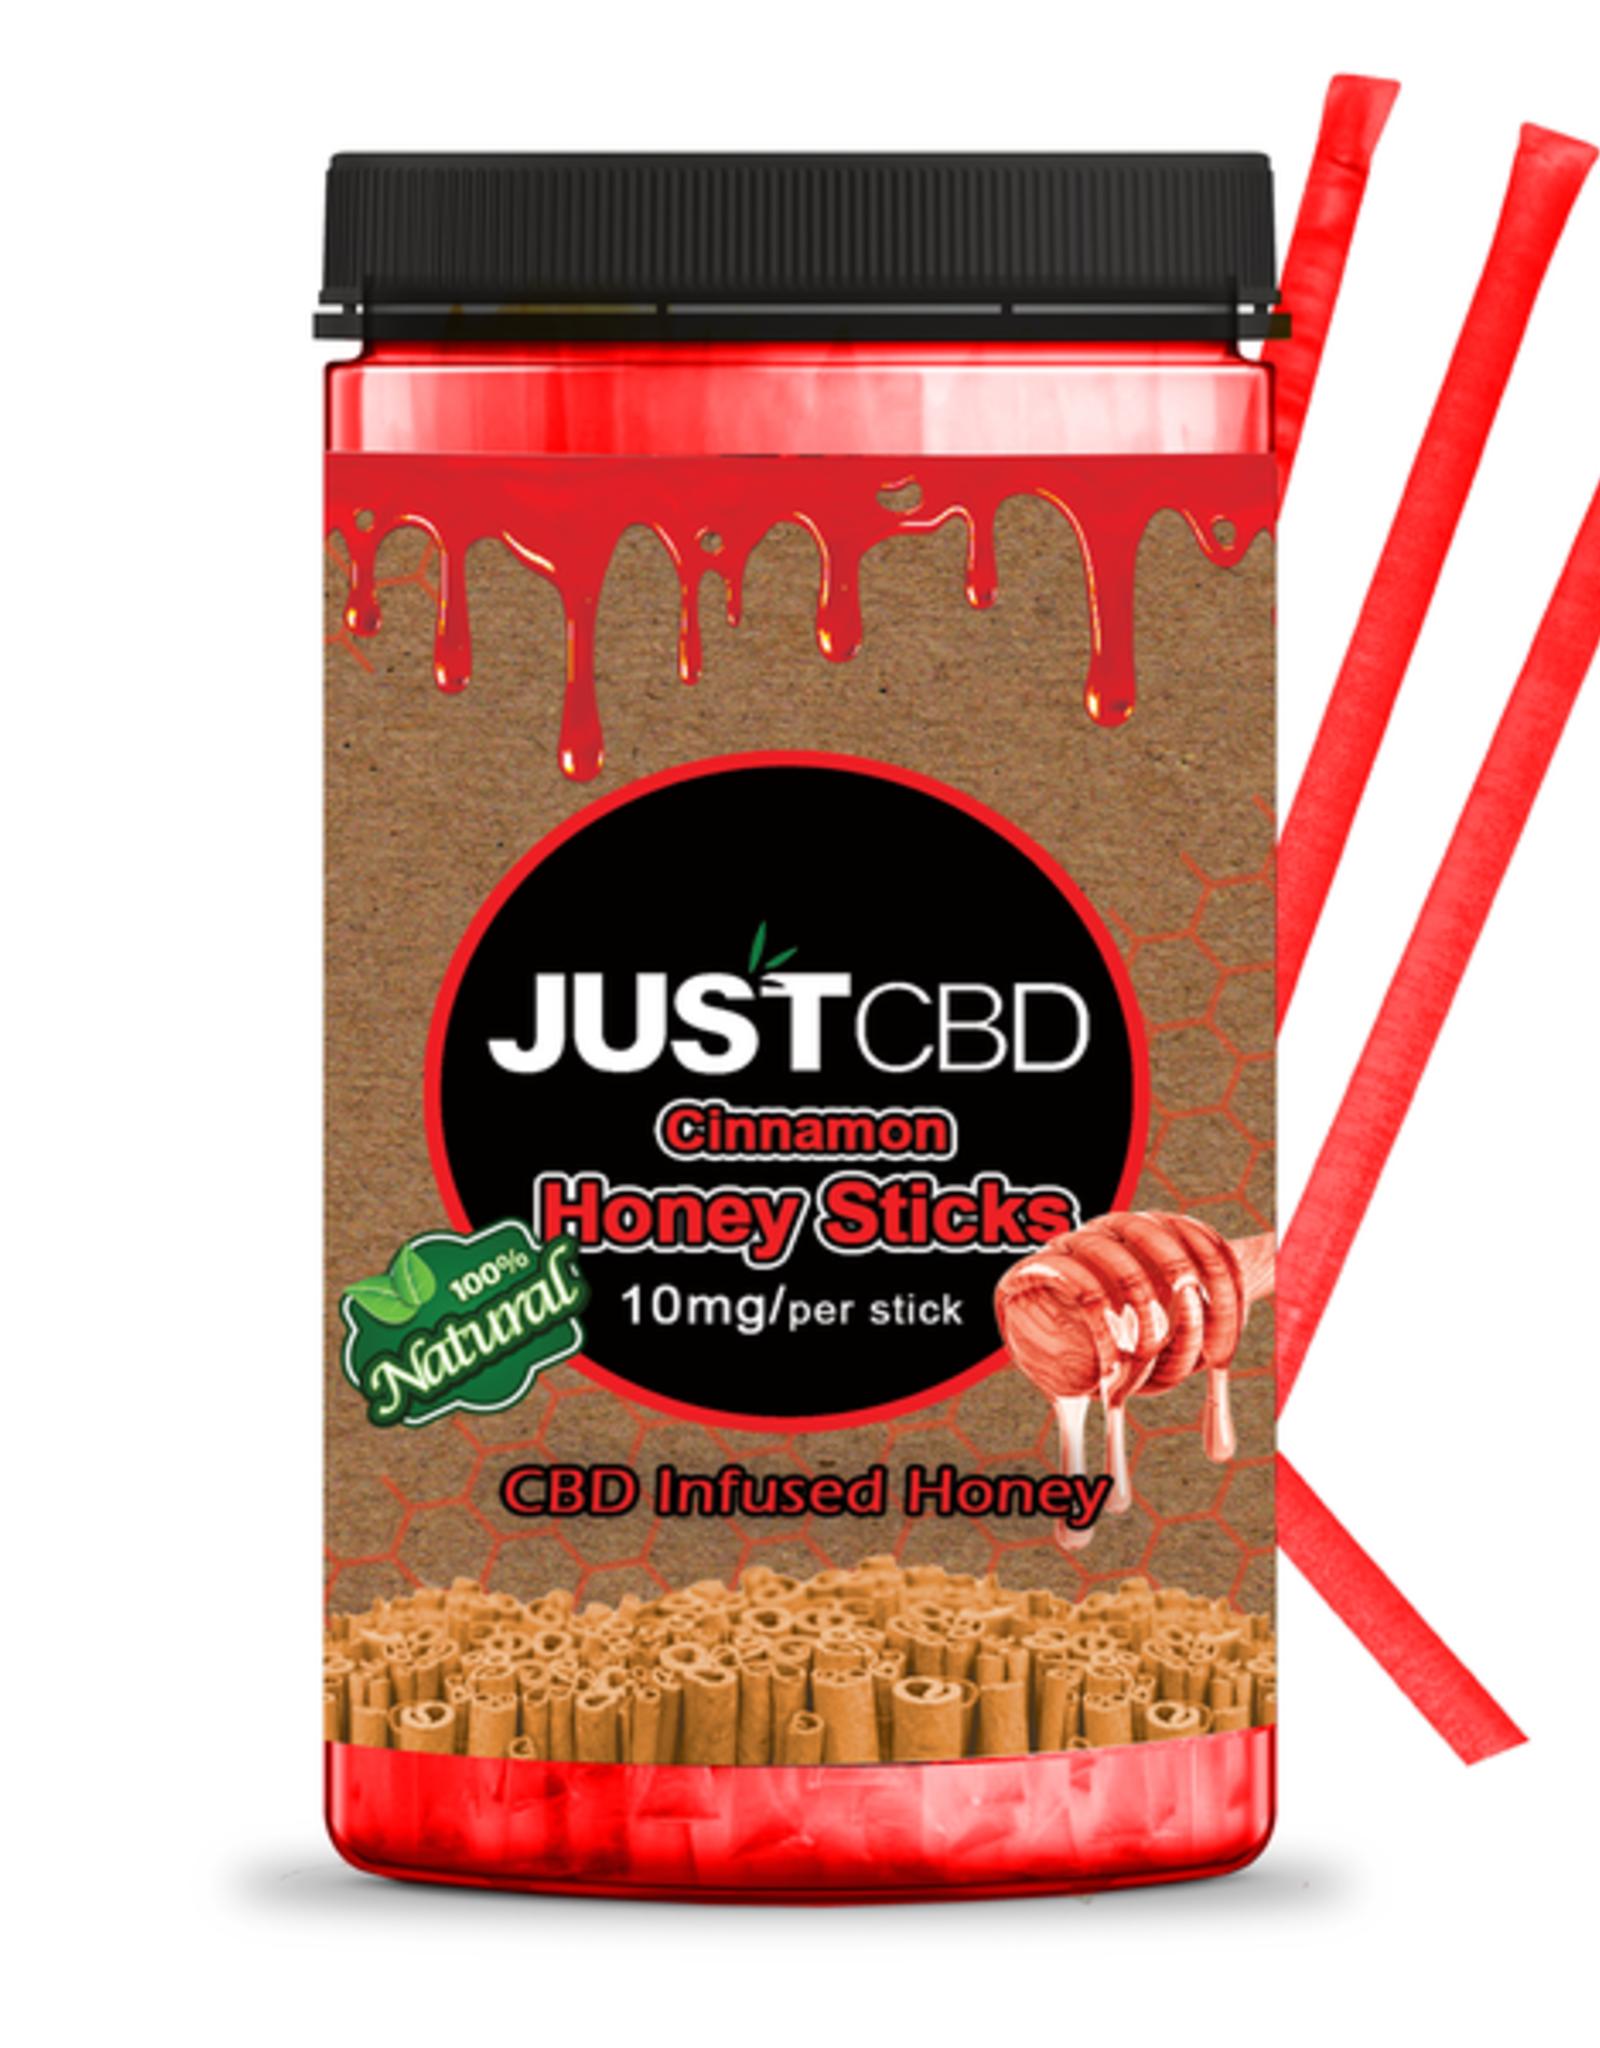 Just CBD Isolate CBD Cinnamon Honey Stick, Single 10mg